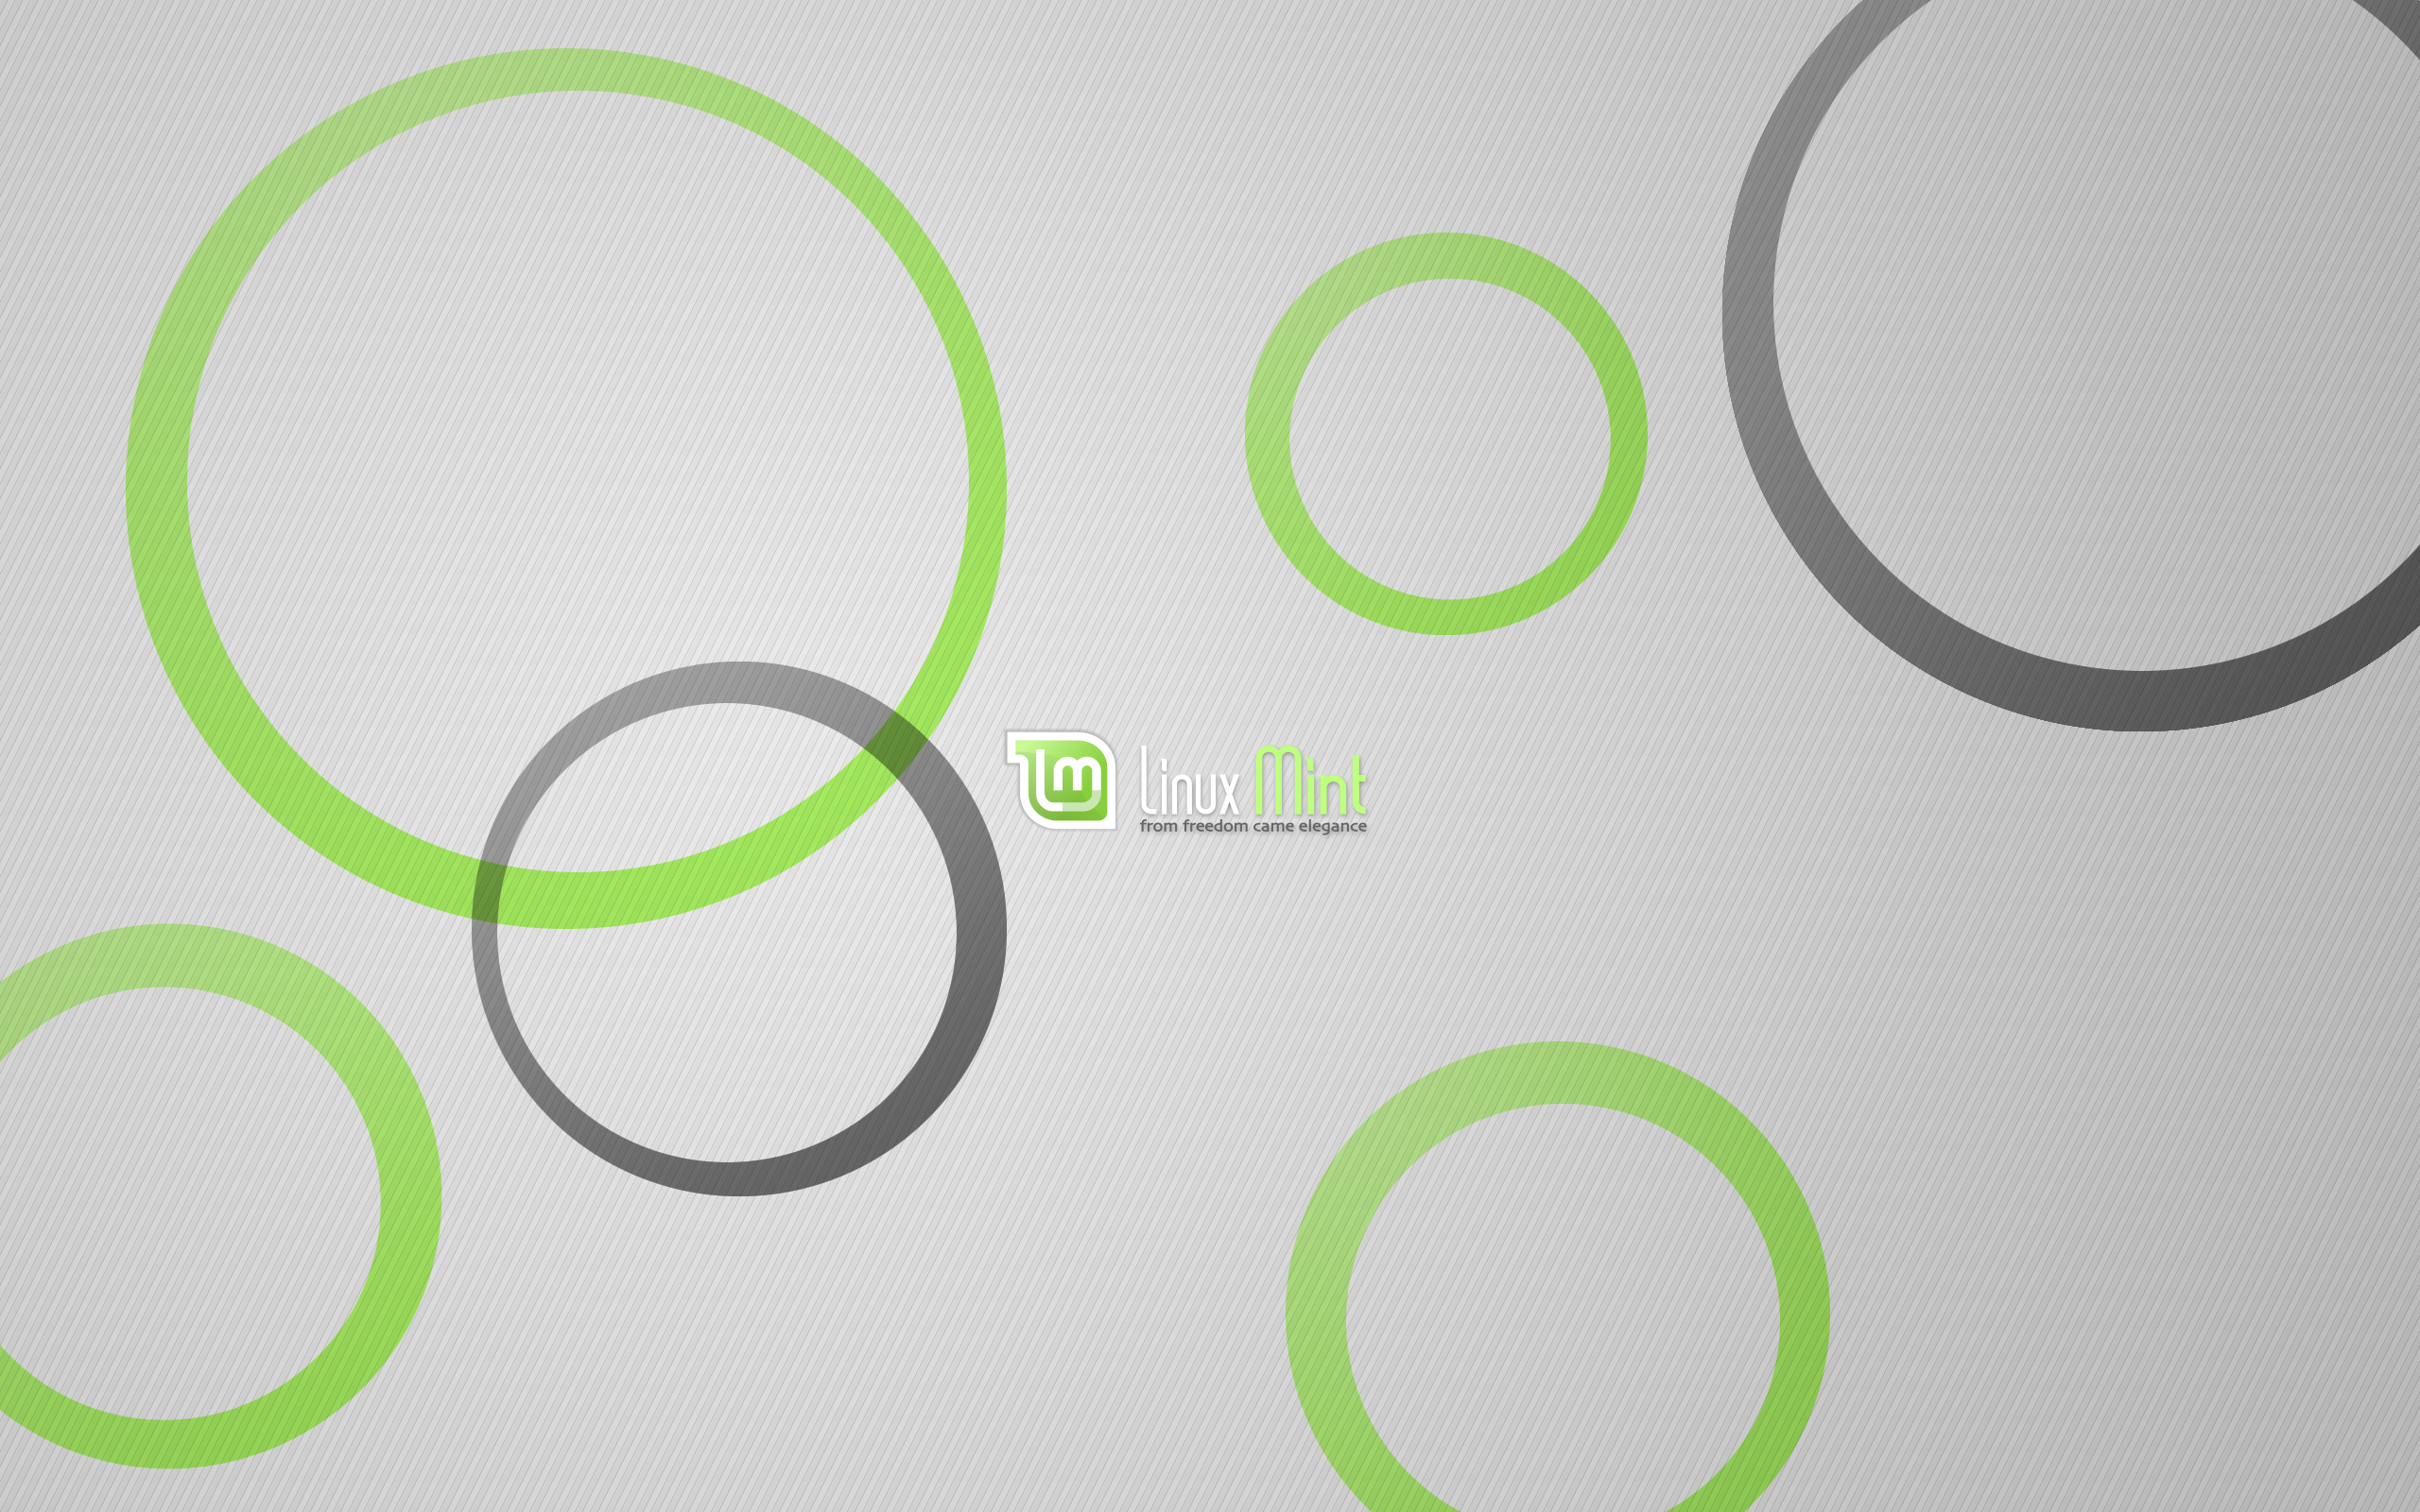 Linux Mint Circles